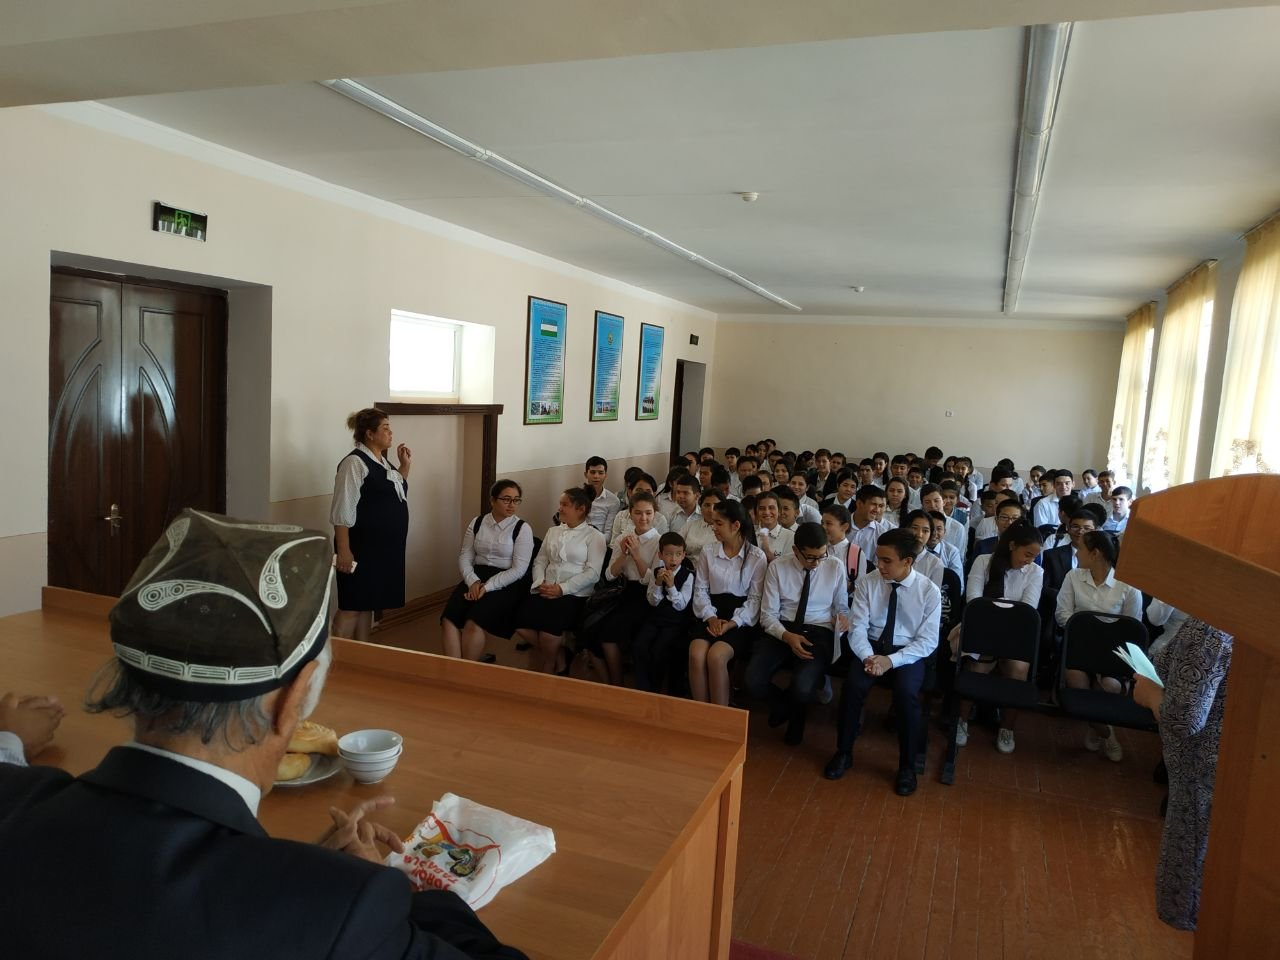 Фото 246112629_407392.jpg. Узбекистан, Toshkent Viloyati, Тошкент, Shirin ko